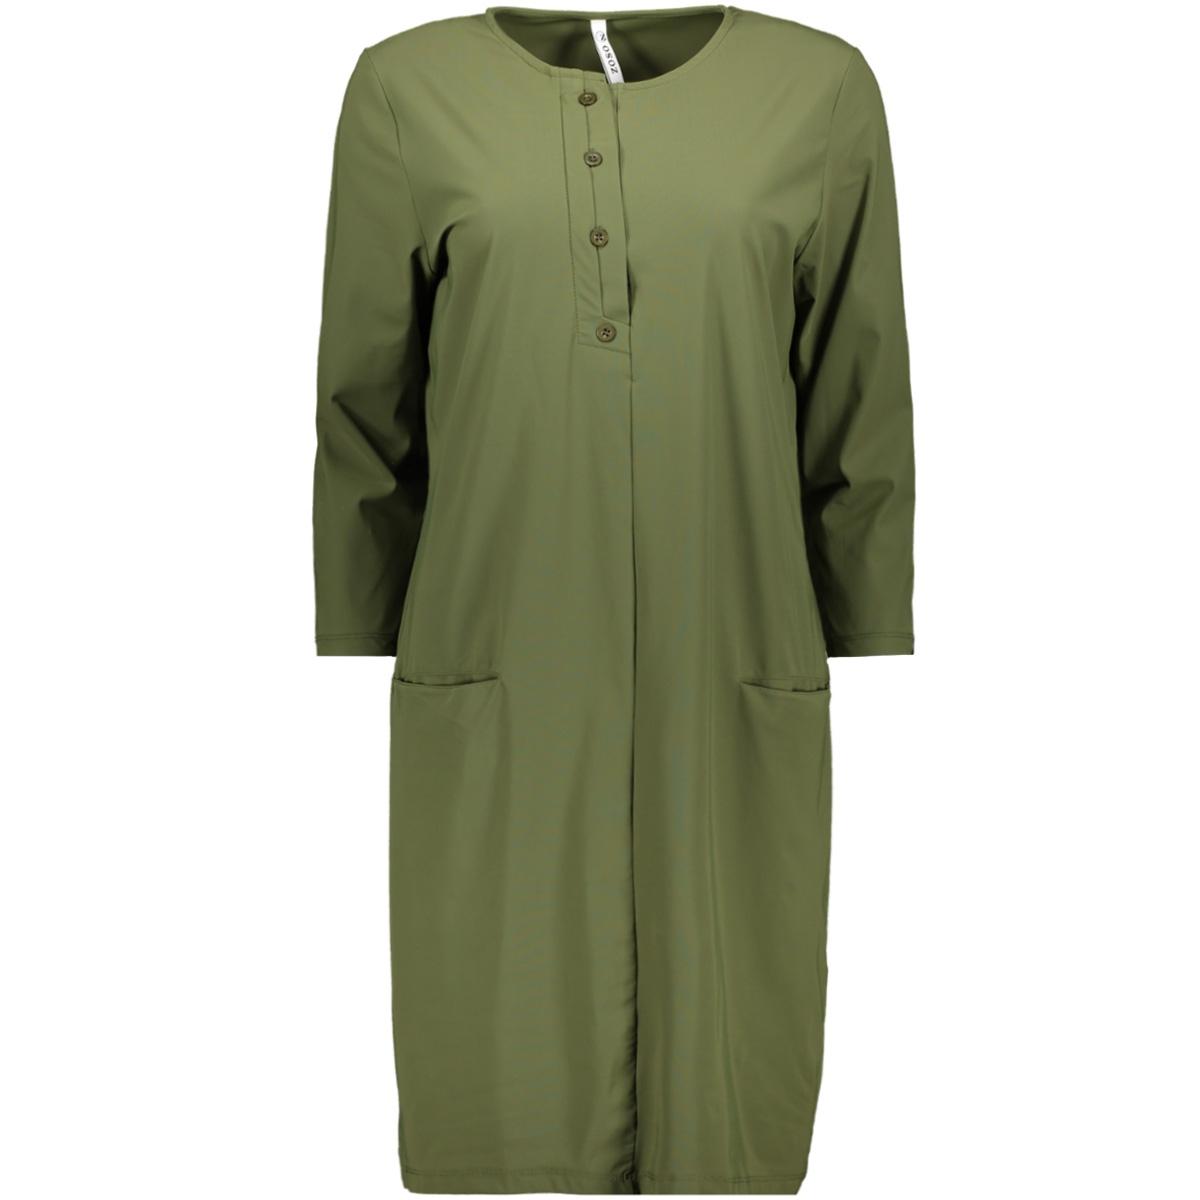 hr1906 zoso jurk army